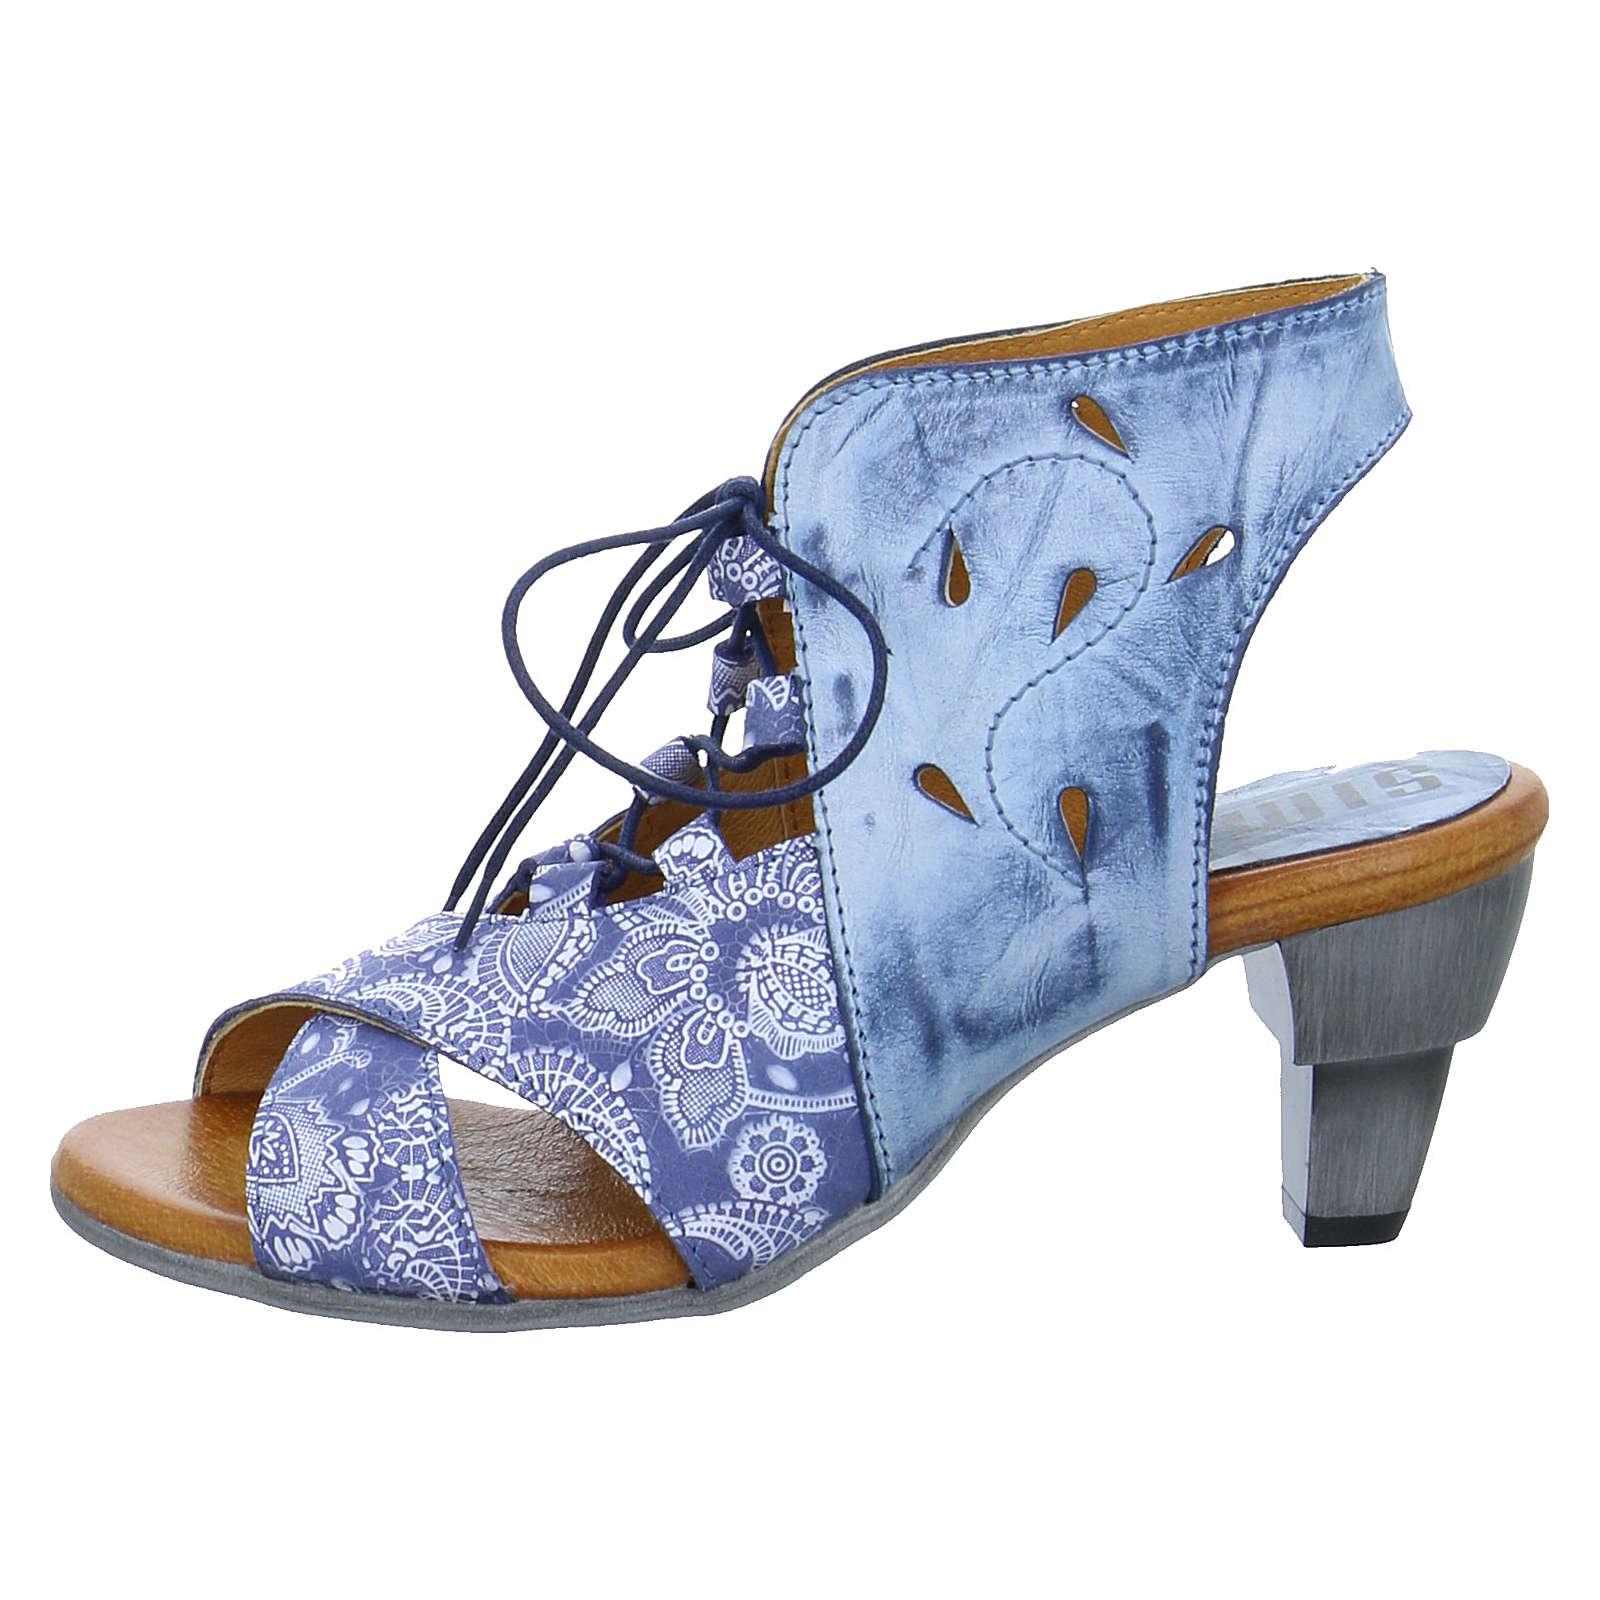 SIMEN Schnürpumps blau Damen Gr. 39